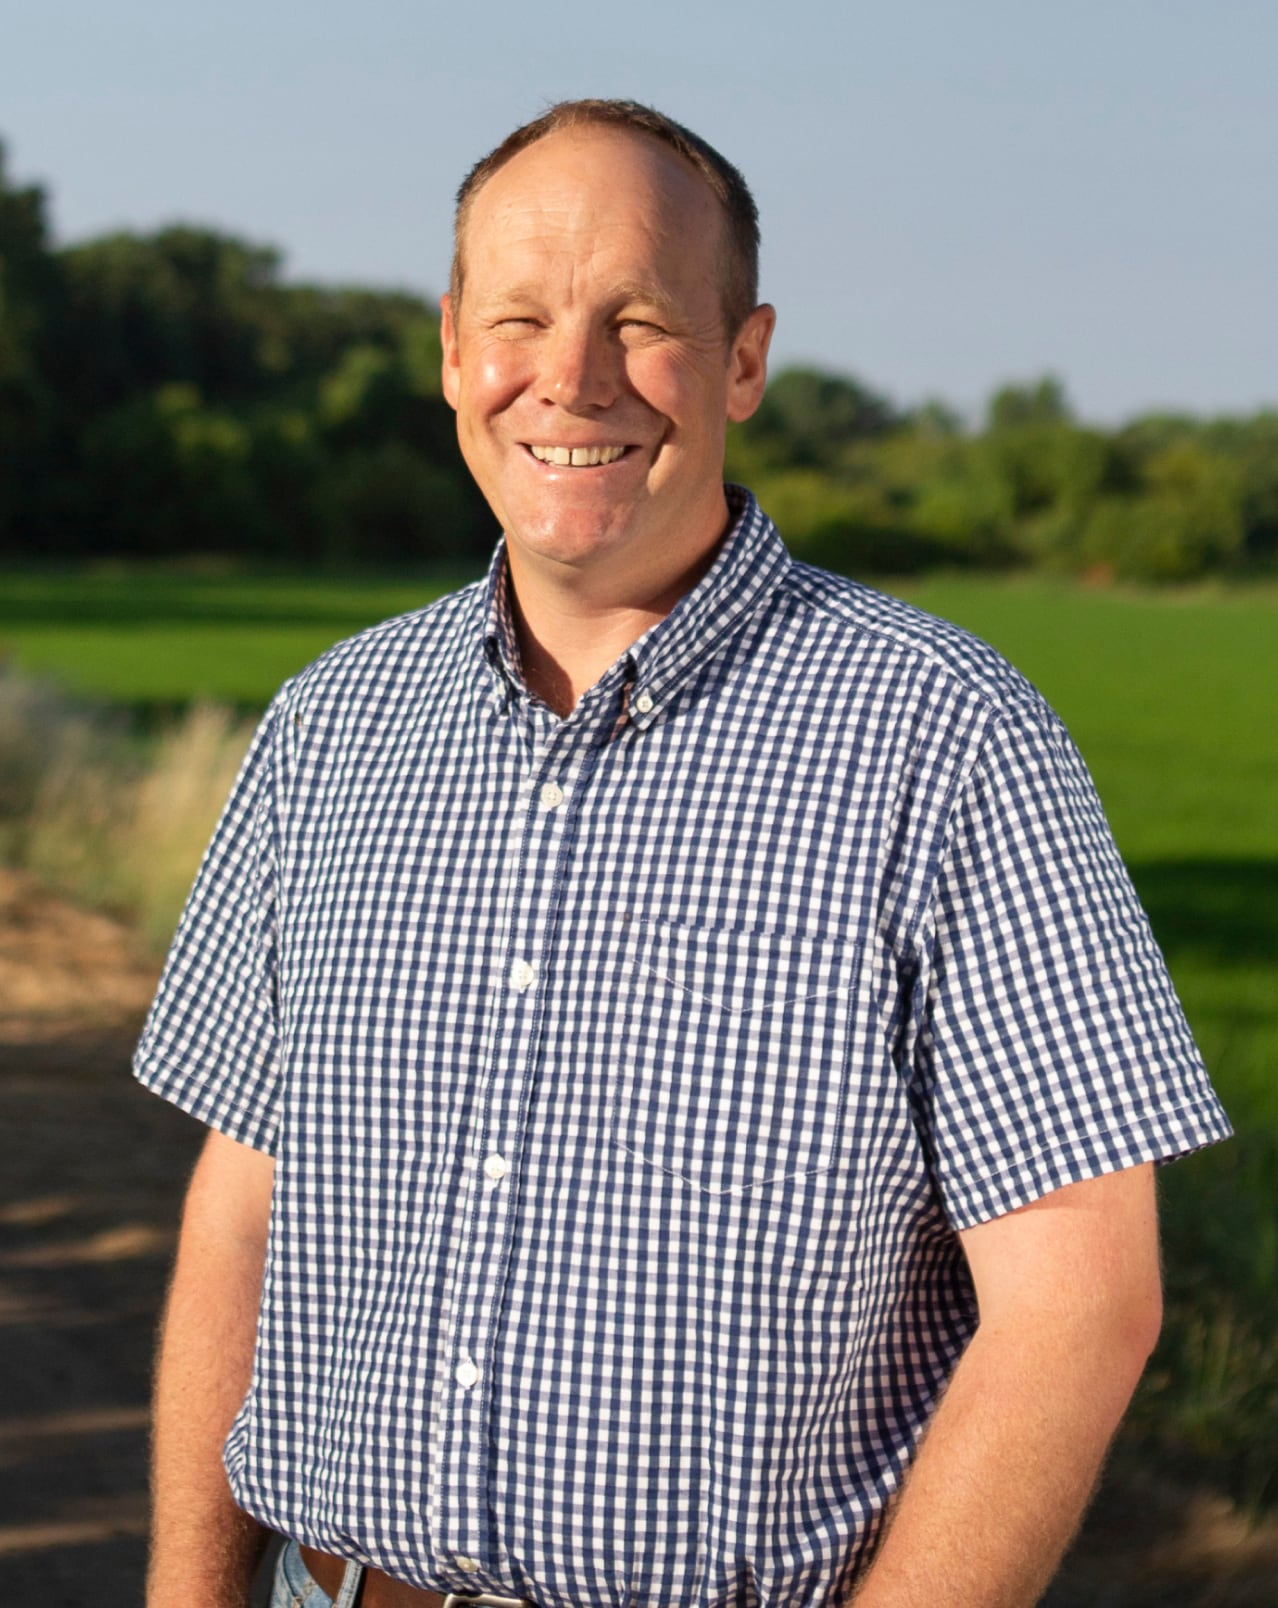 Michael Bosworth, co-founder of True Origins.